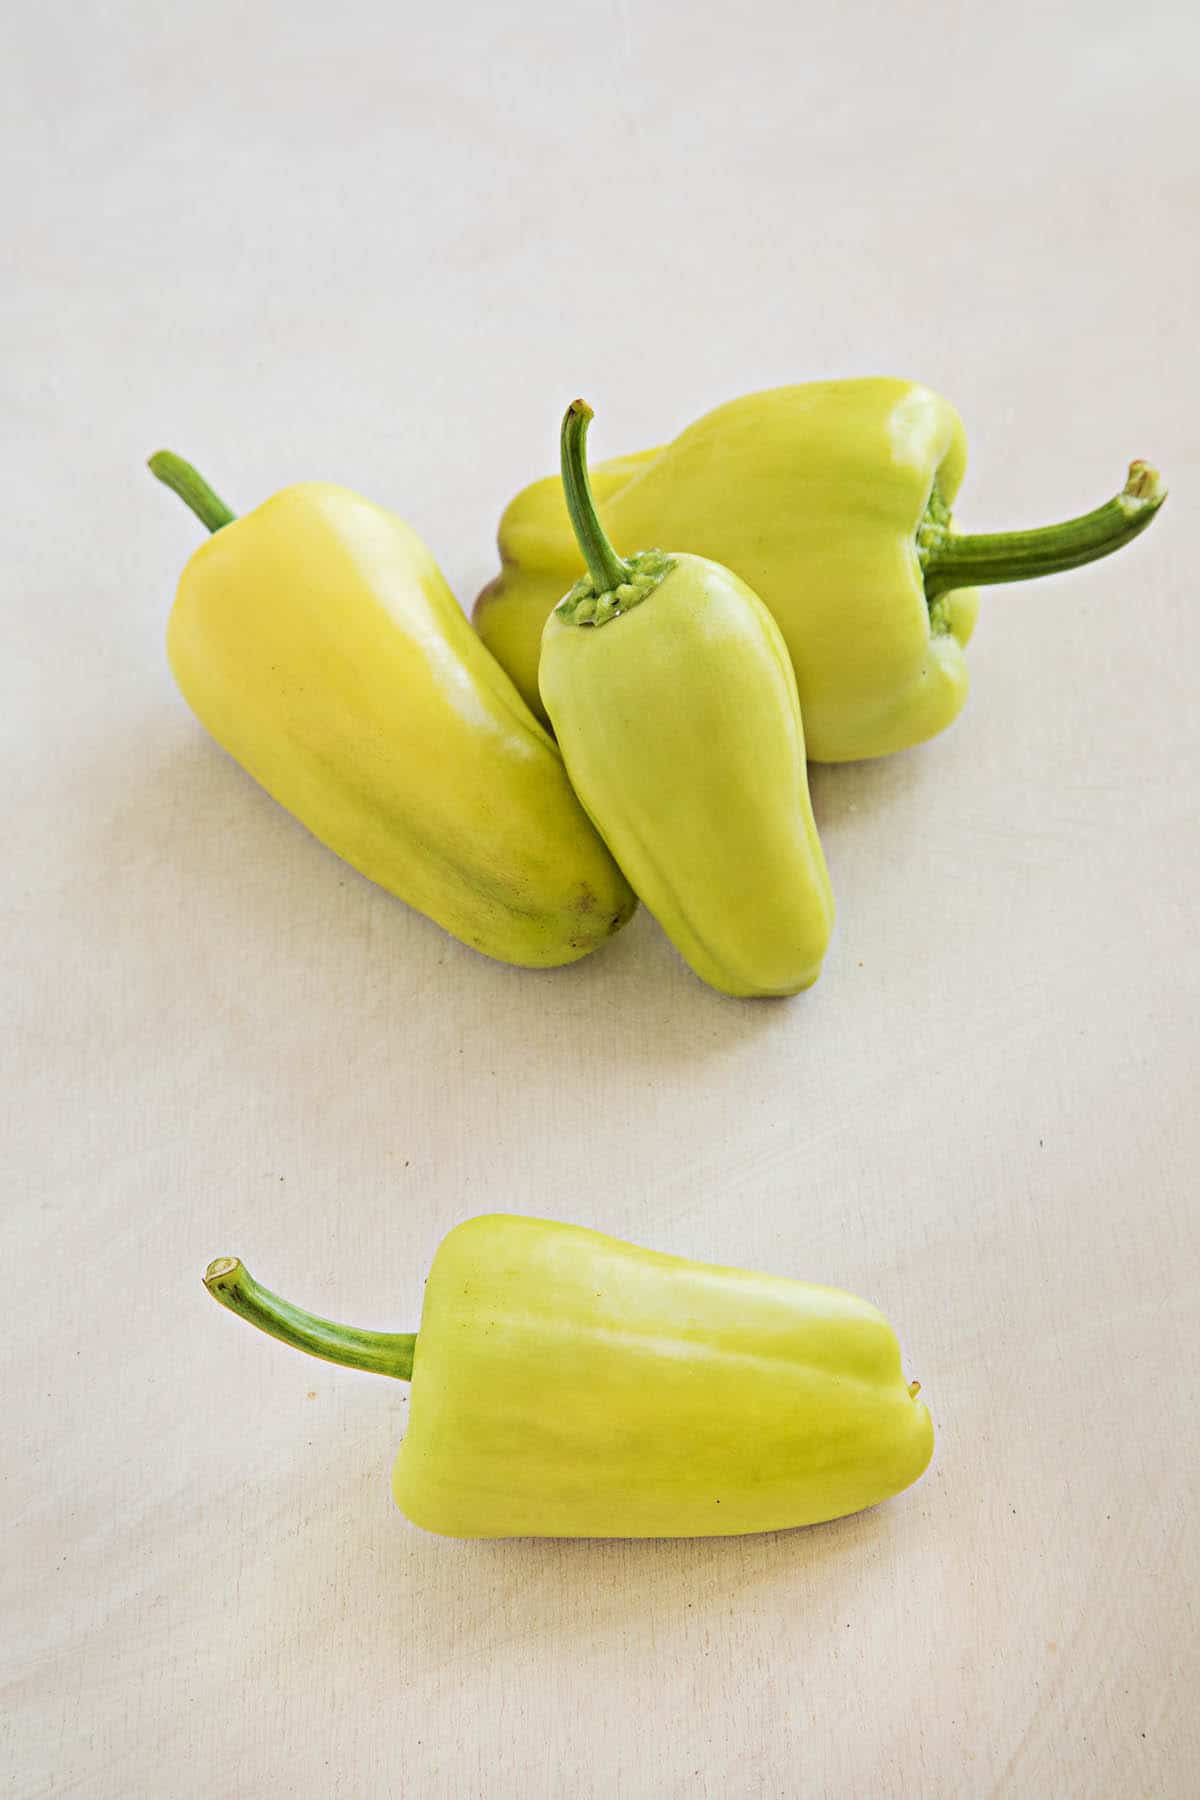 Gypsy Pepper: A Sweet Hybrid Pepper